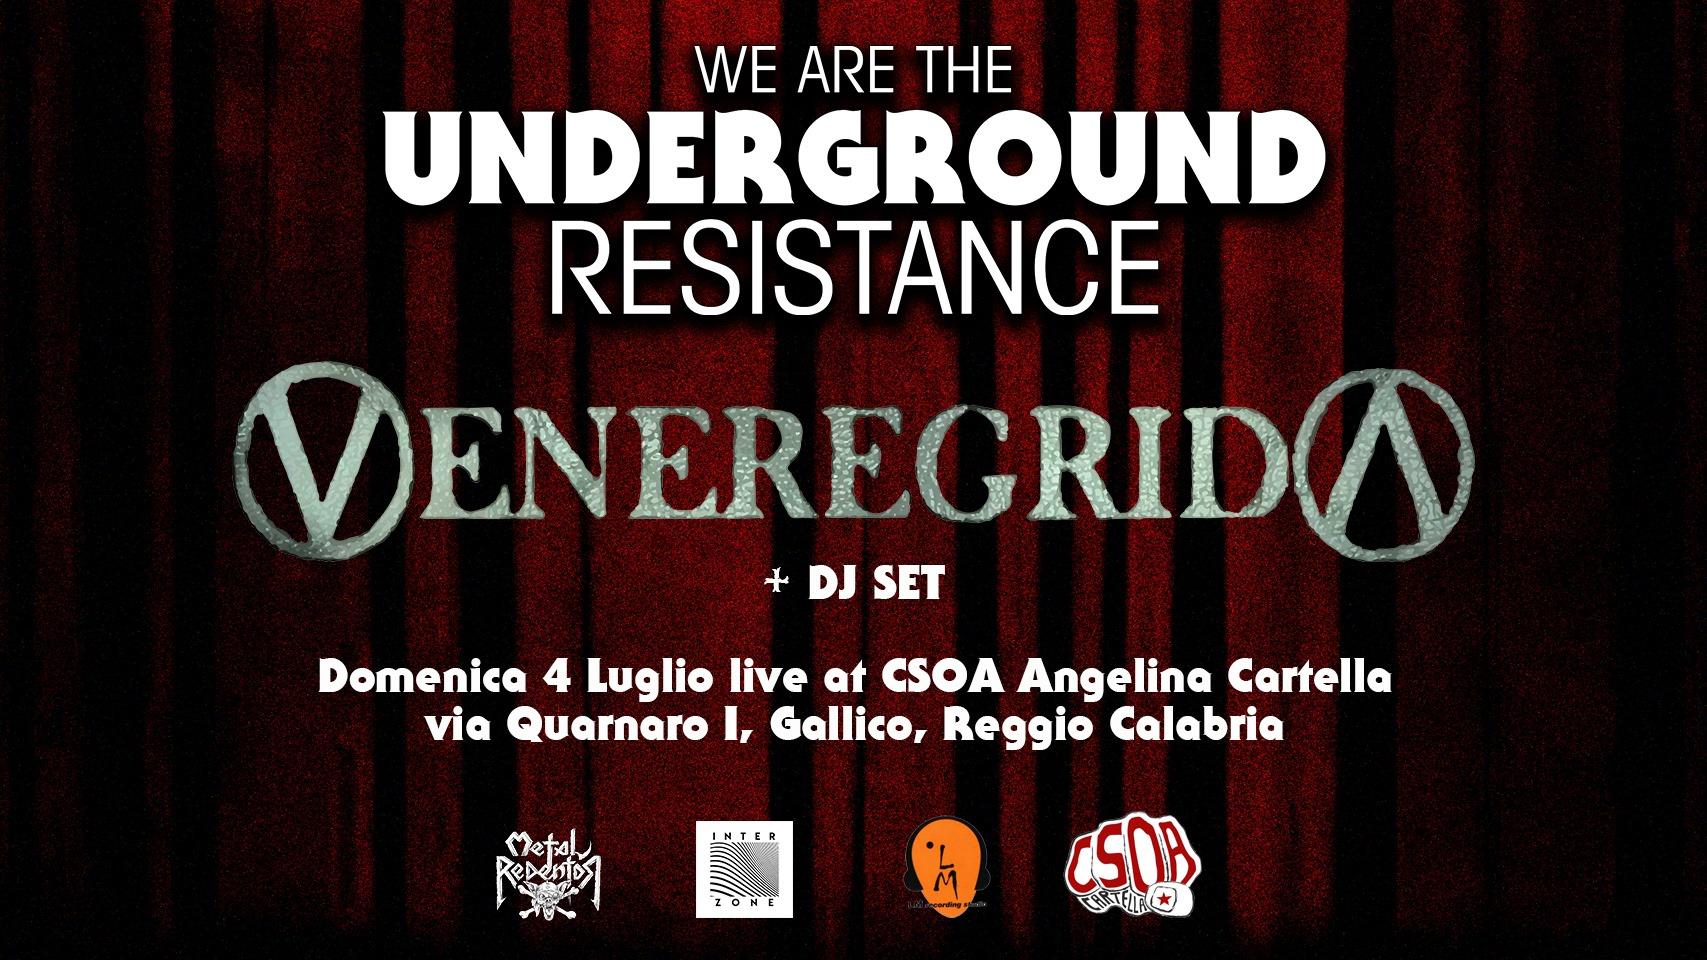 We Are the Underground Resistance - Veneregrida live